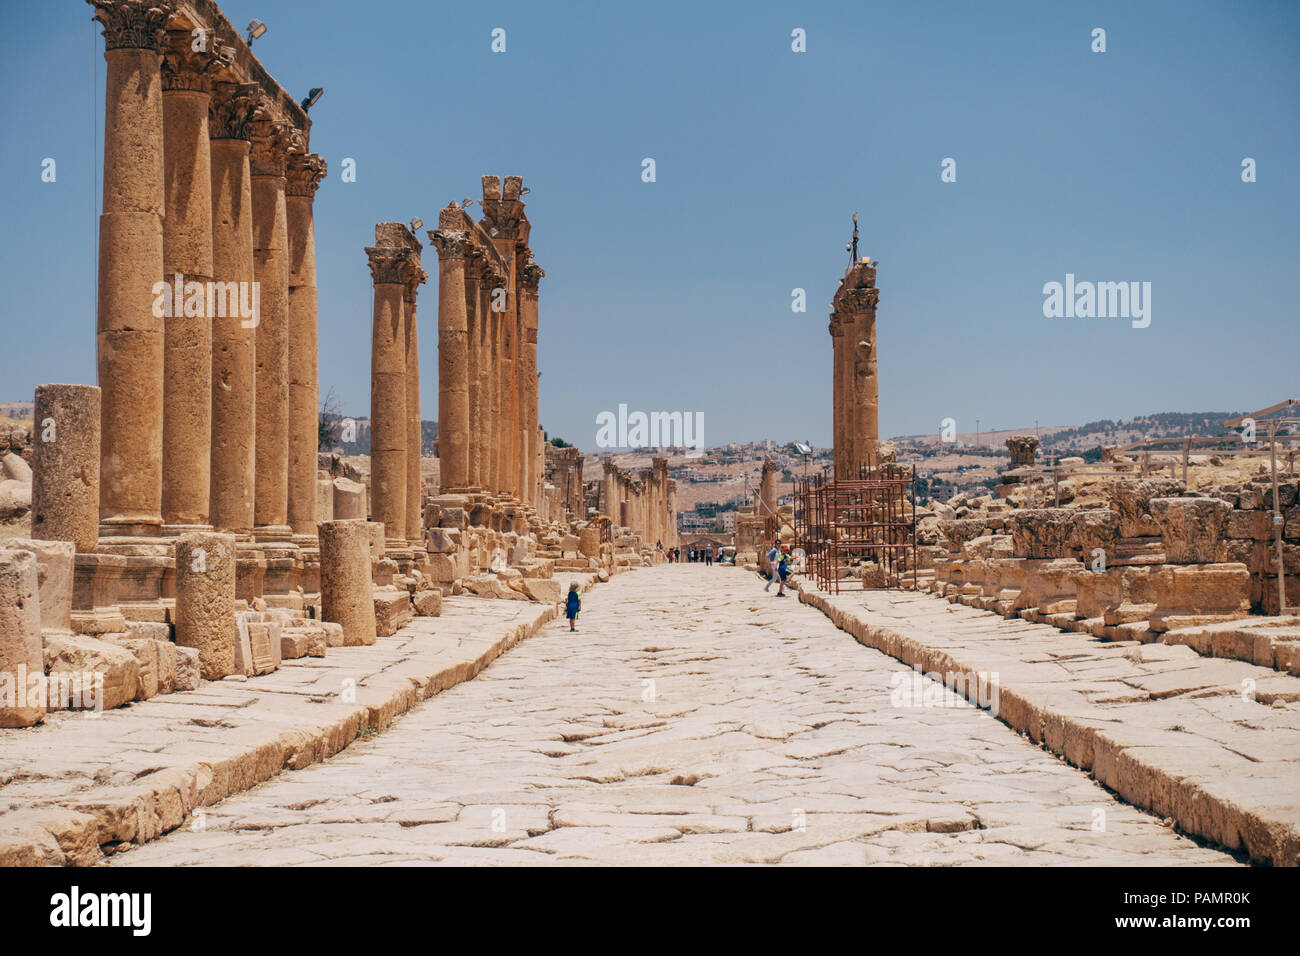 Antiguo grecorromano línea columnas calles adoquinadas en un cálido día de verano en Jerash, Jordania Foto de stock